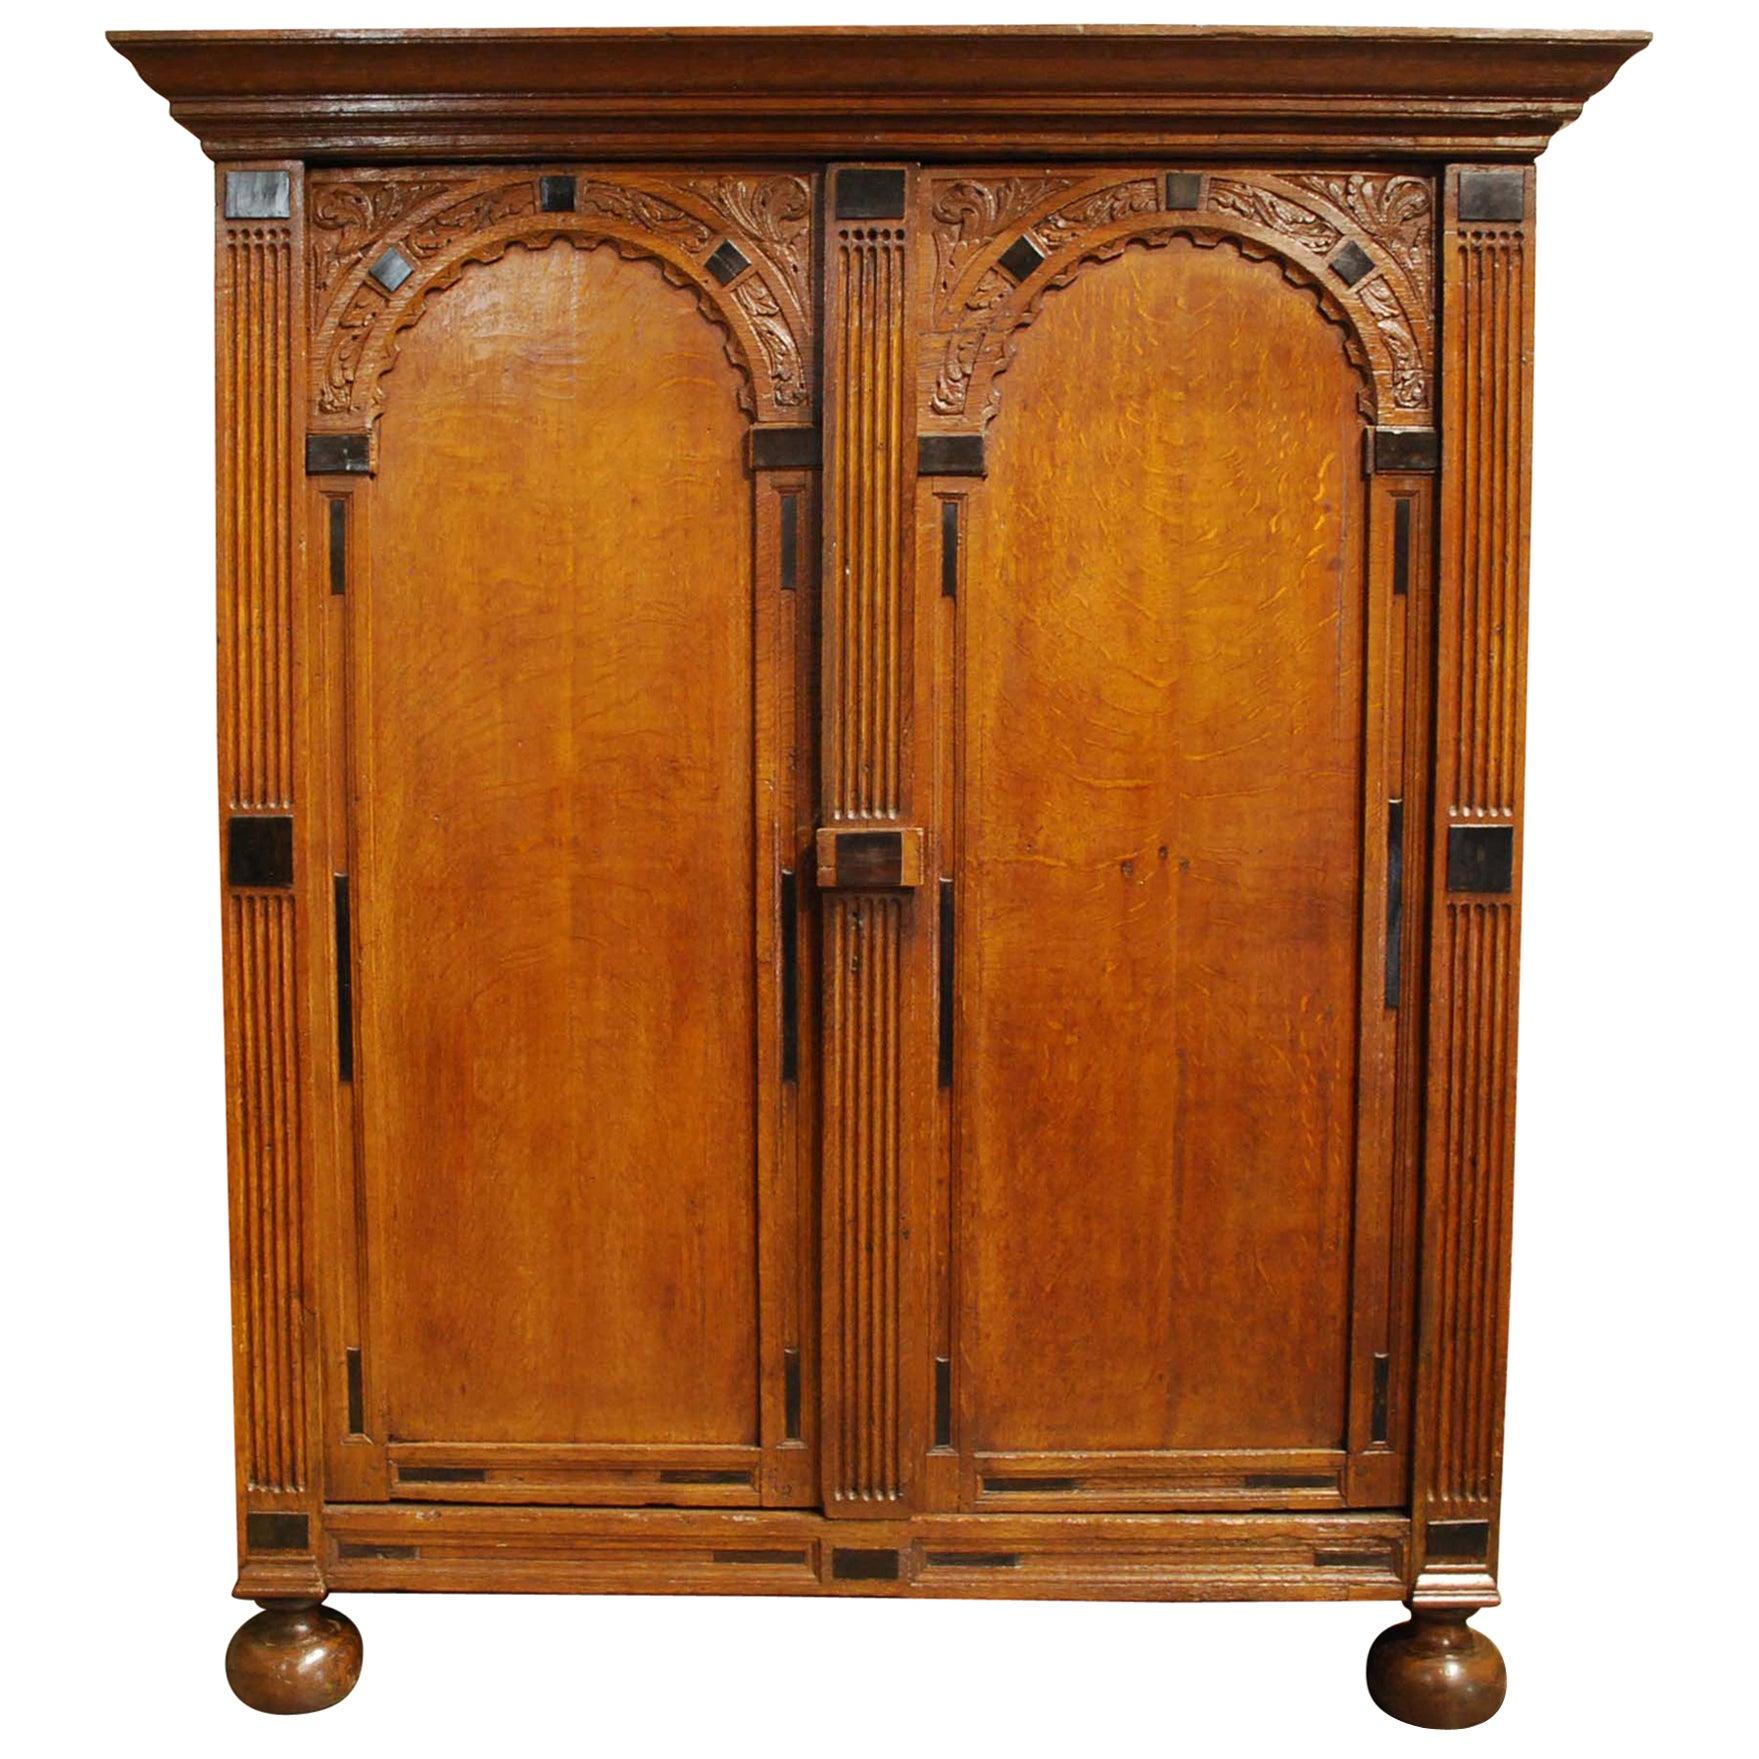 Antique 17th Century Oak and Ebony Two-Door Renaissance Cabinet